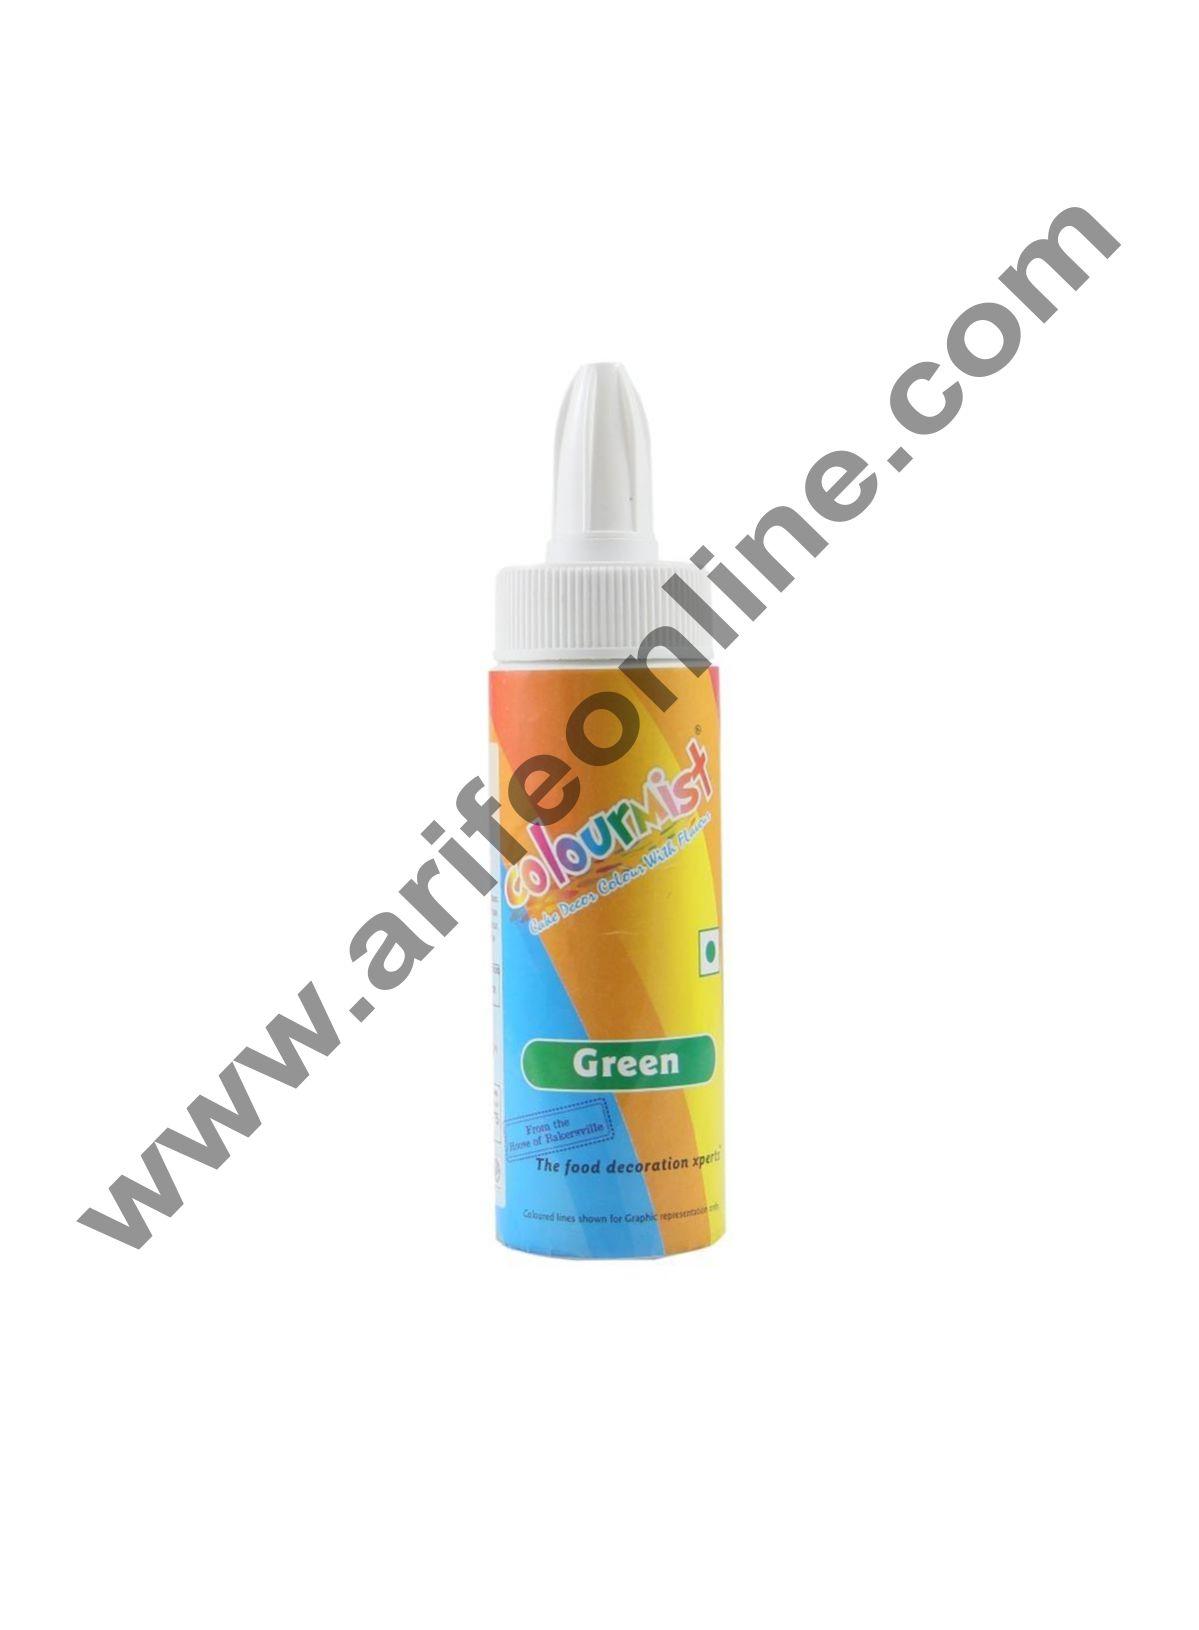 Colourmist Powder Spray (Green), 60gm